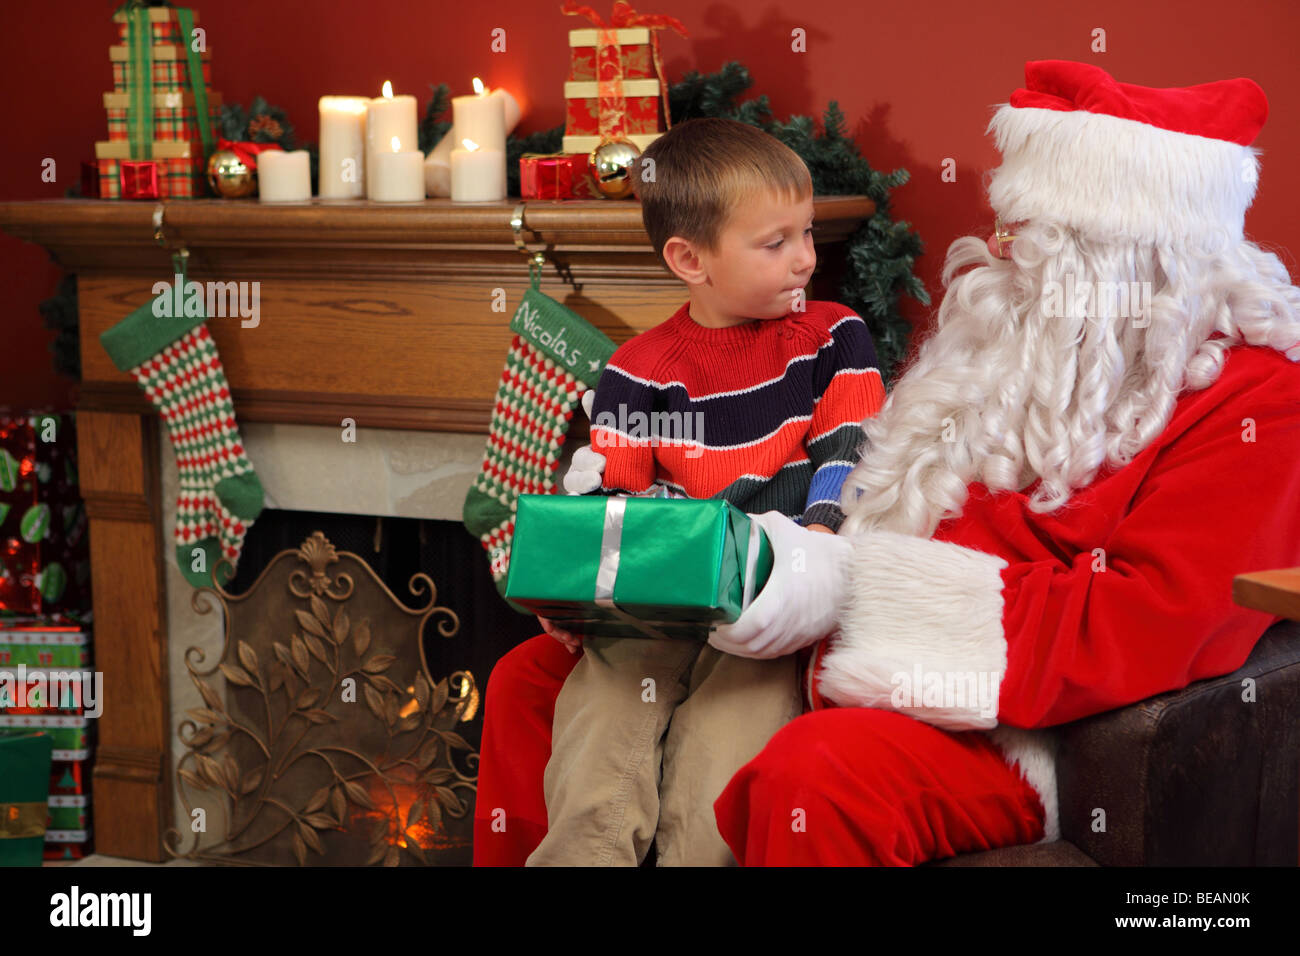 Santa Claus gives young boy Christmas gift - Stock Image